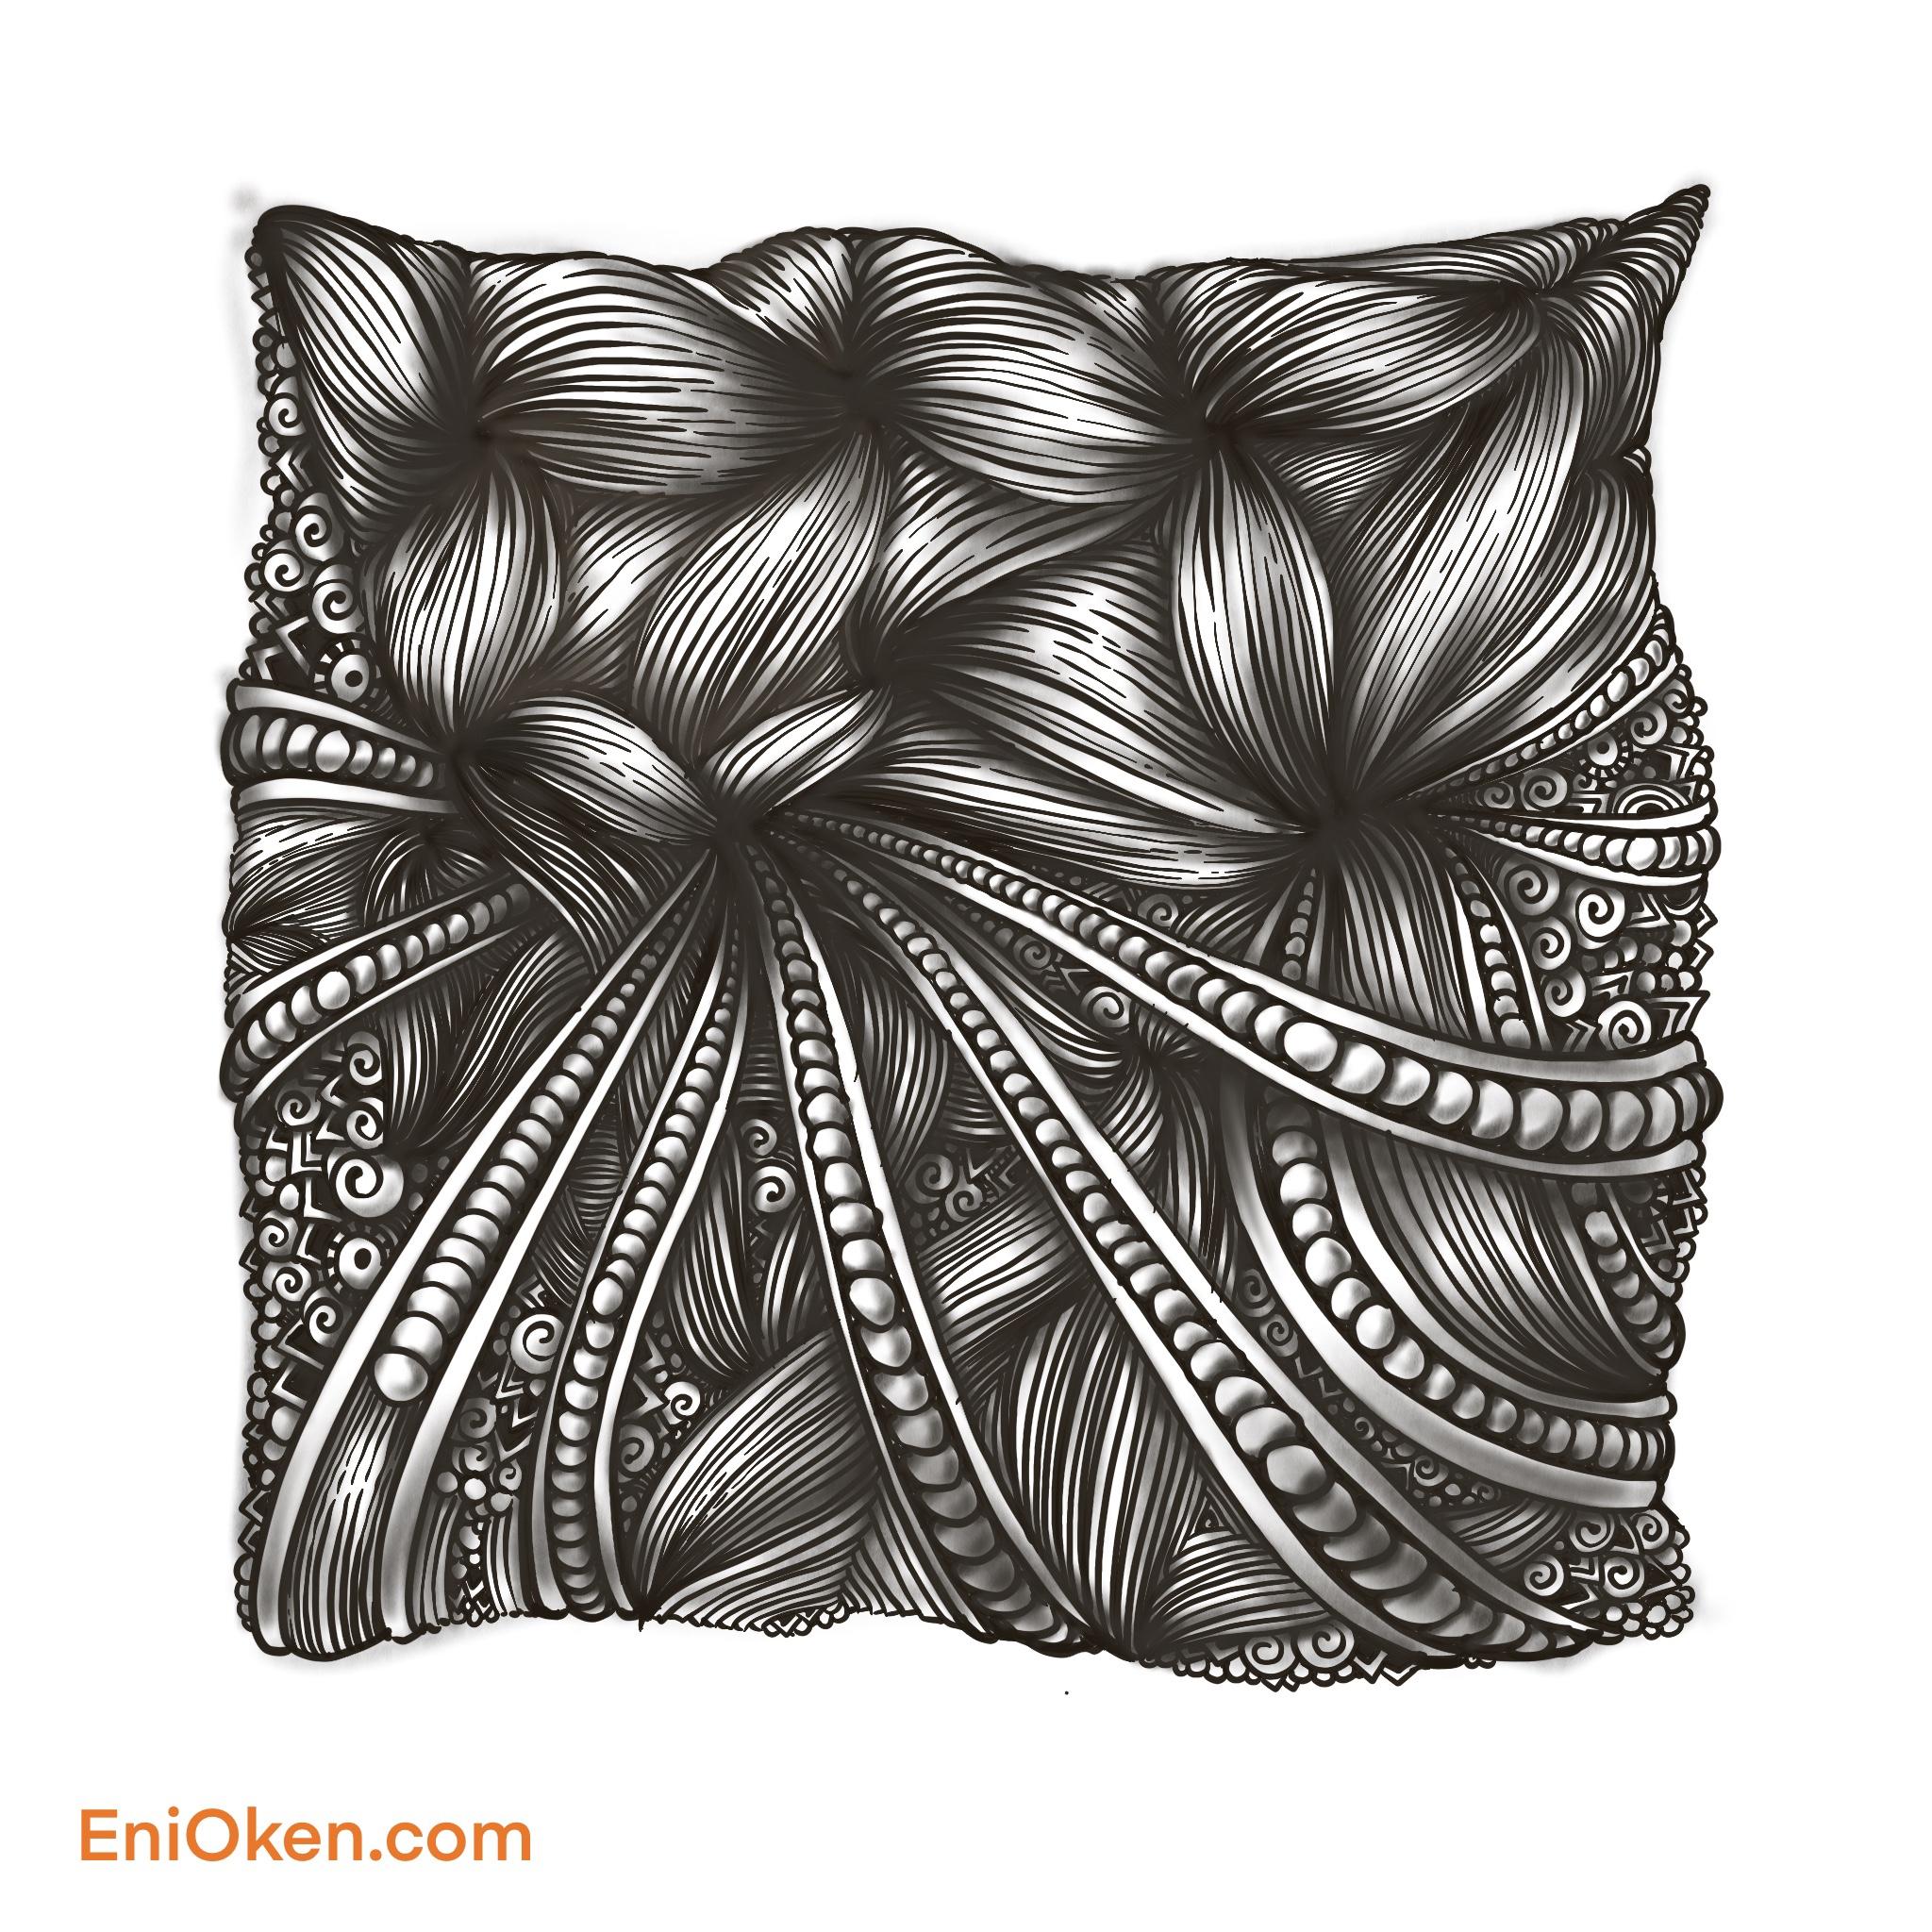 Ravel, Zentwining and Organic Borders • enioken.com